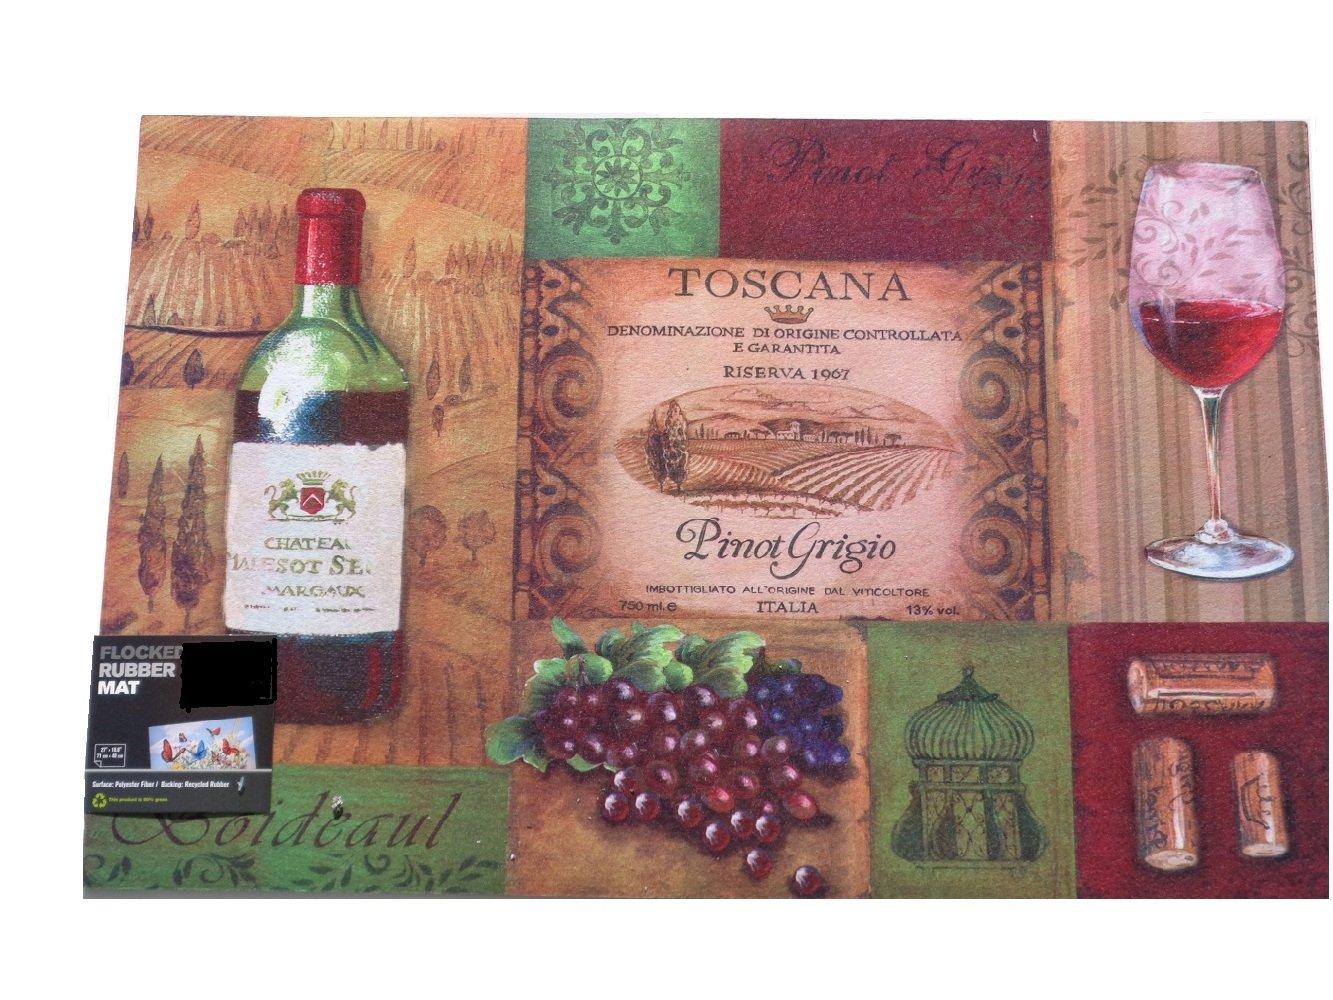 Tuscan Wine Bottle Glass Grapes Rubber Mat Kitchen Bar Rug